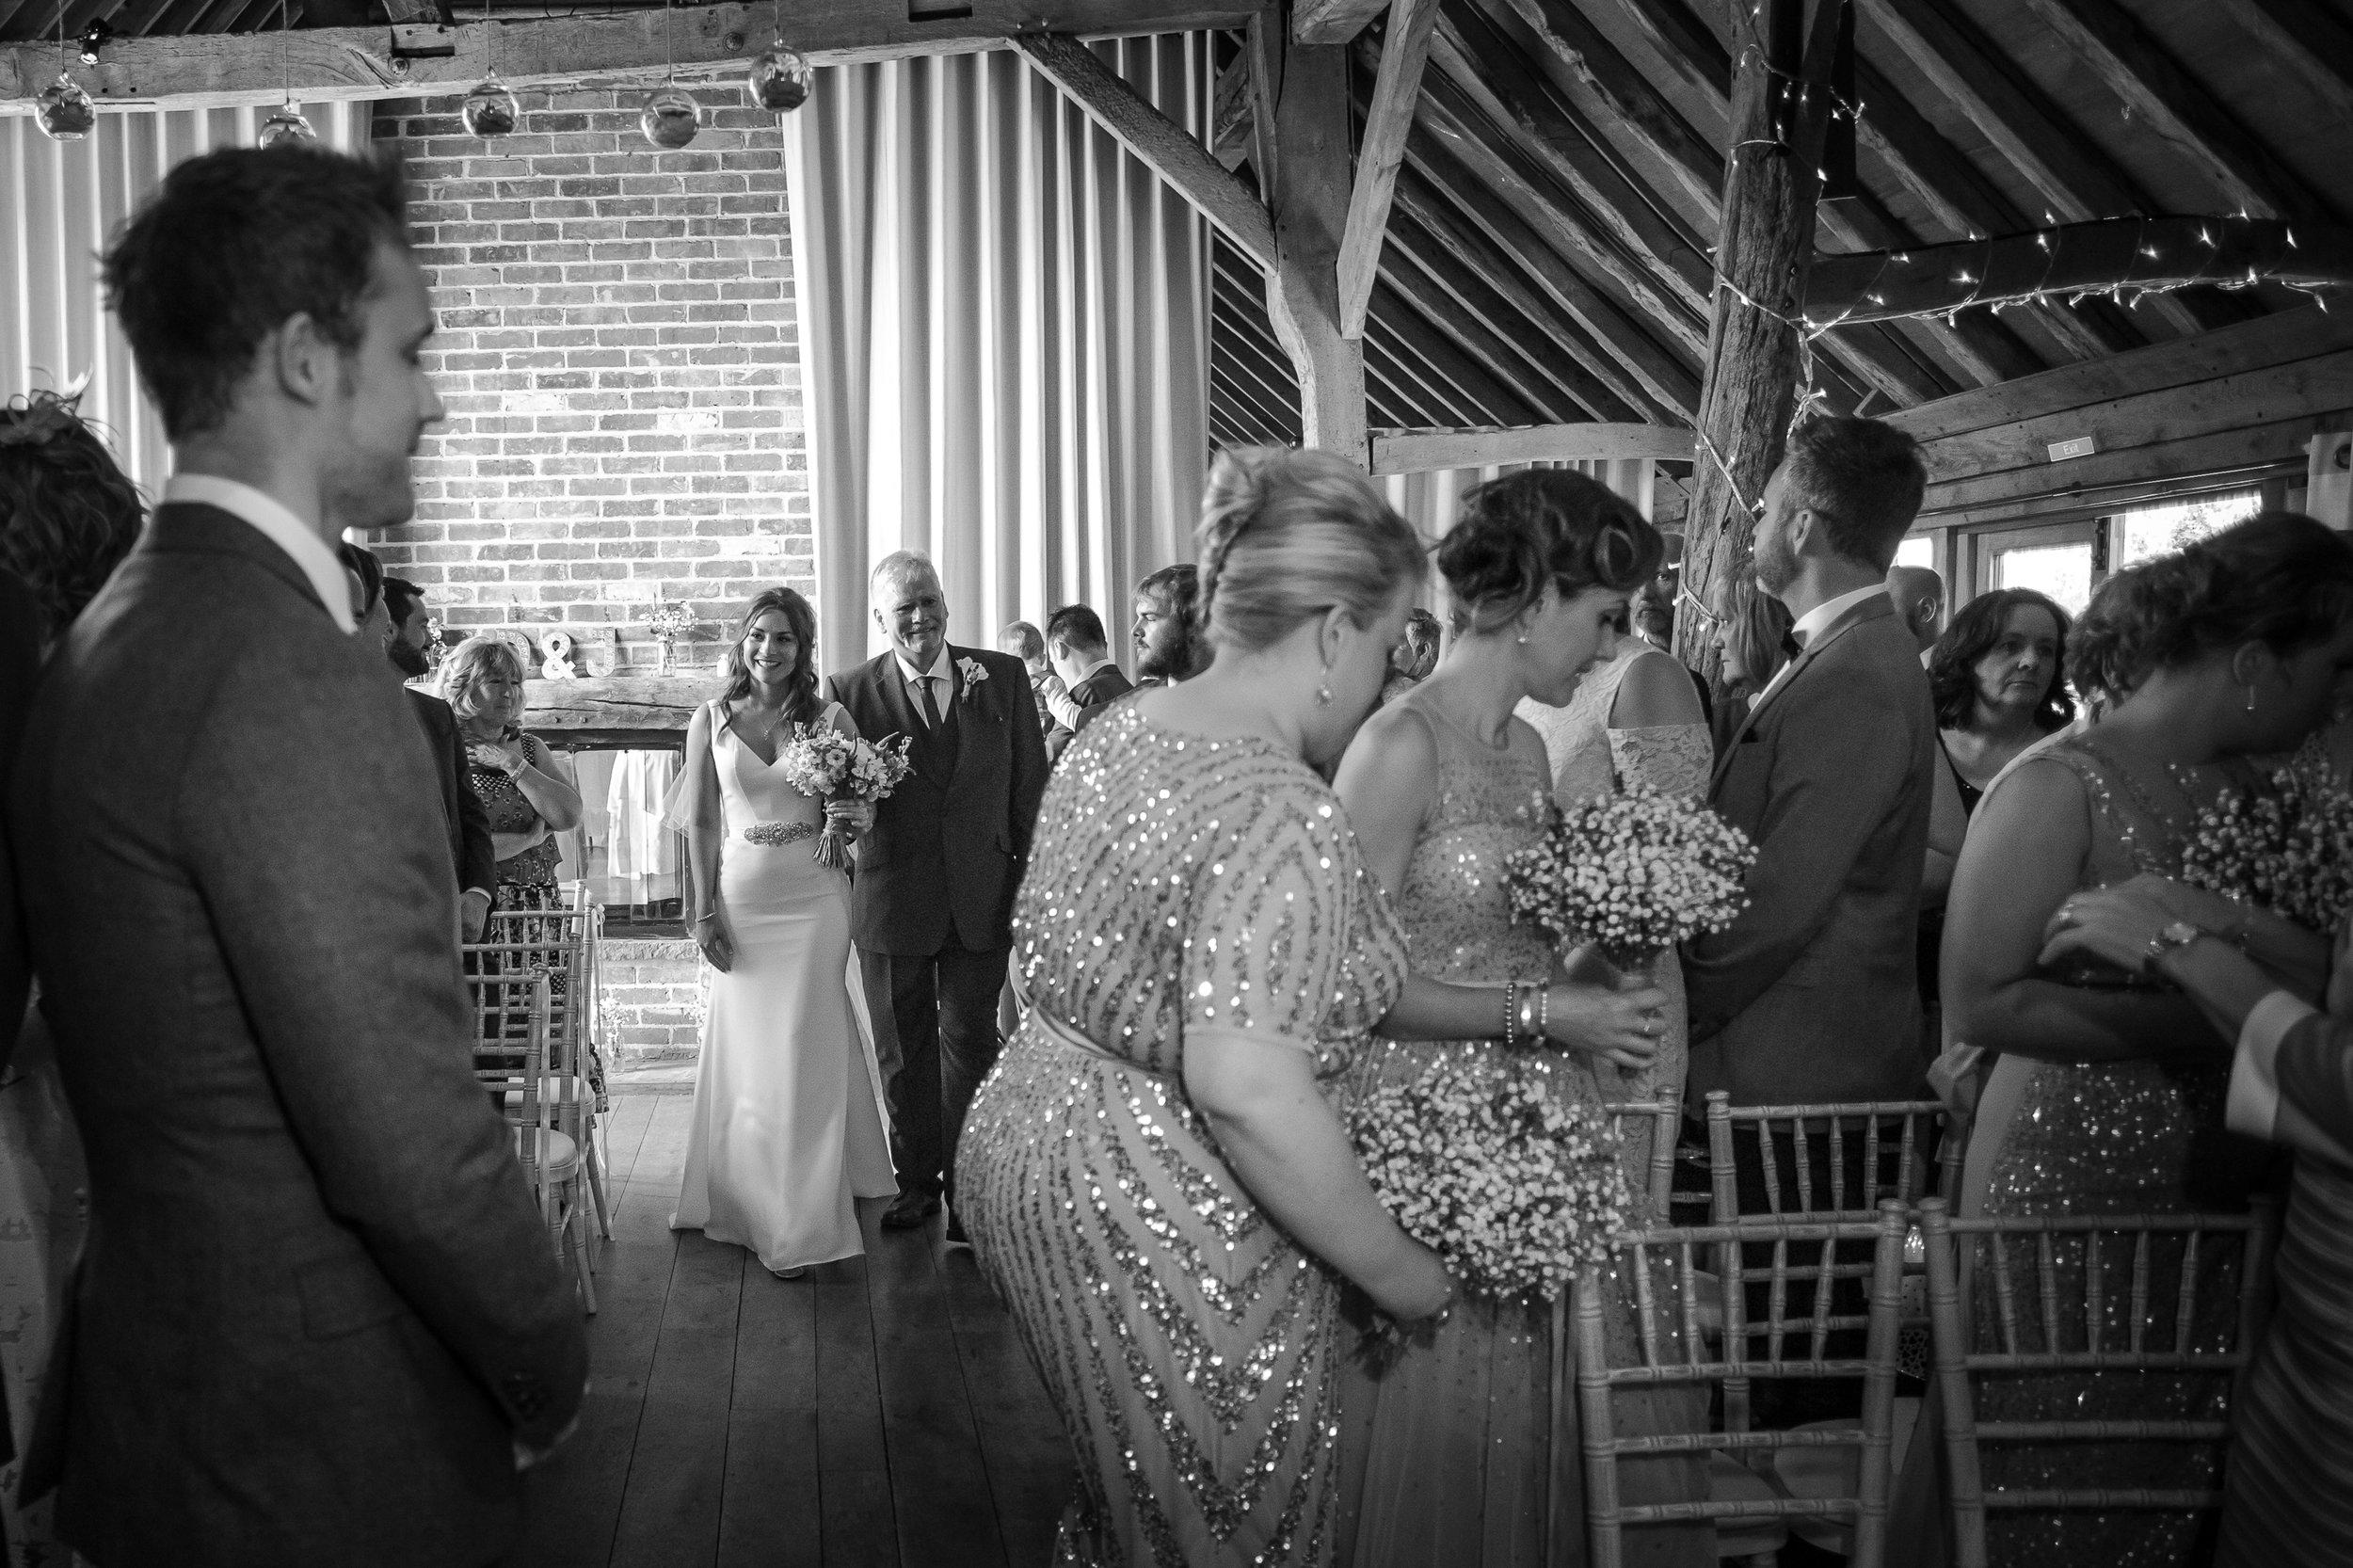 Grittenham Barn female wedding photographers west sussex petworth social-49.jpg